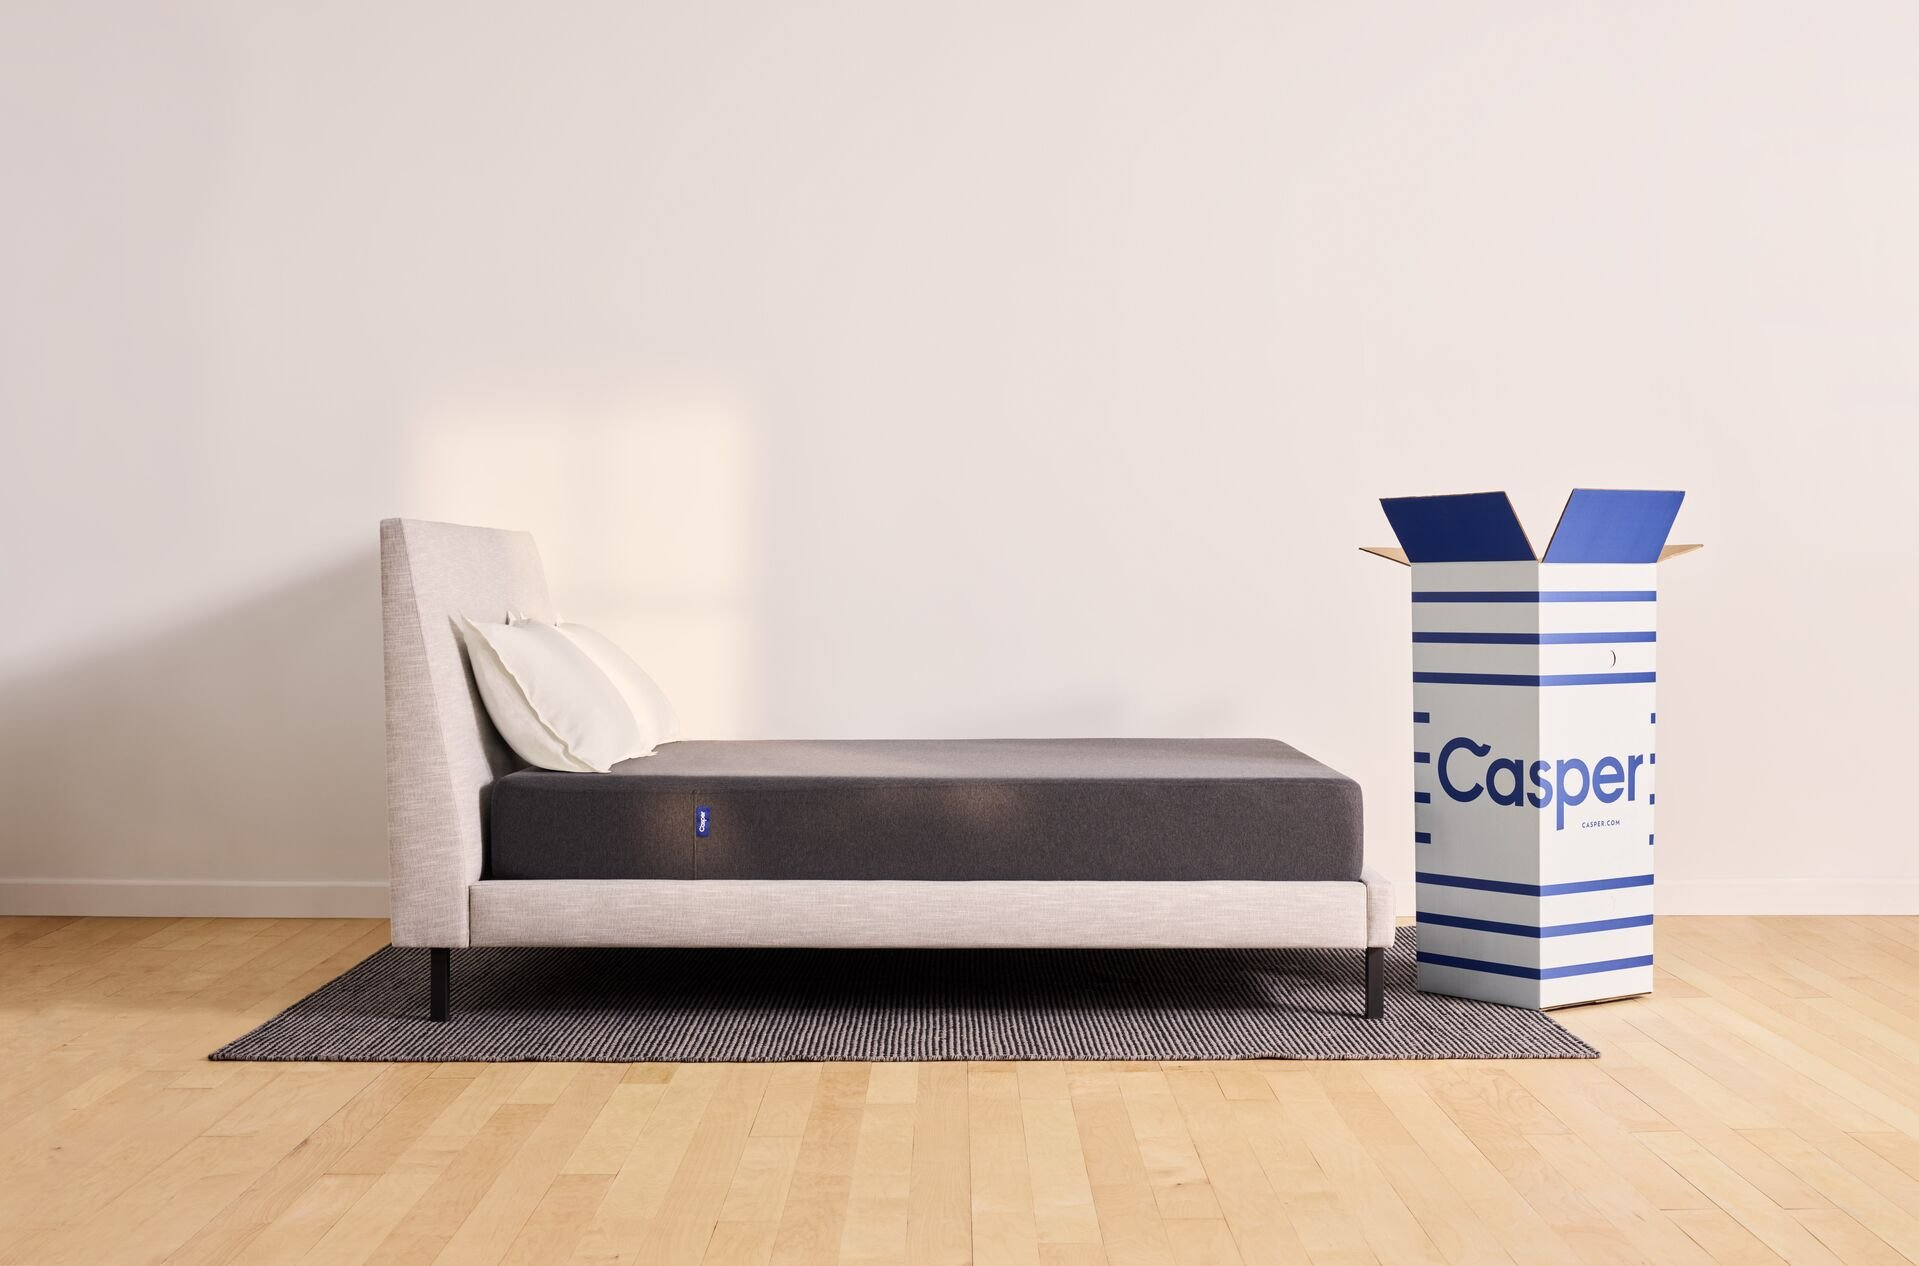 Casper Essential mattress review: A solid budget option